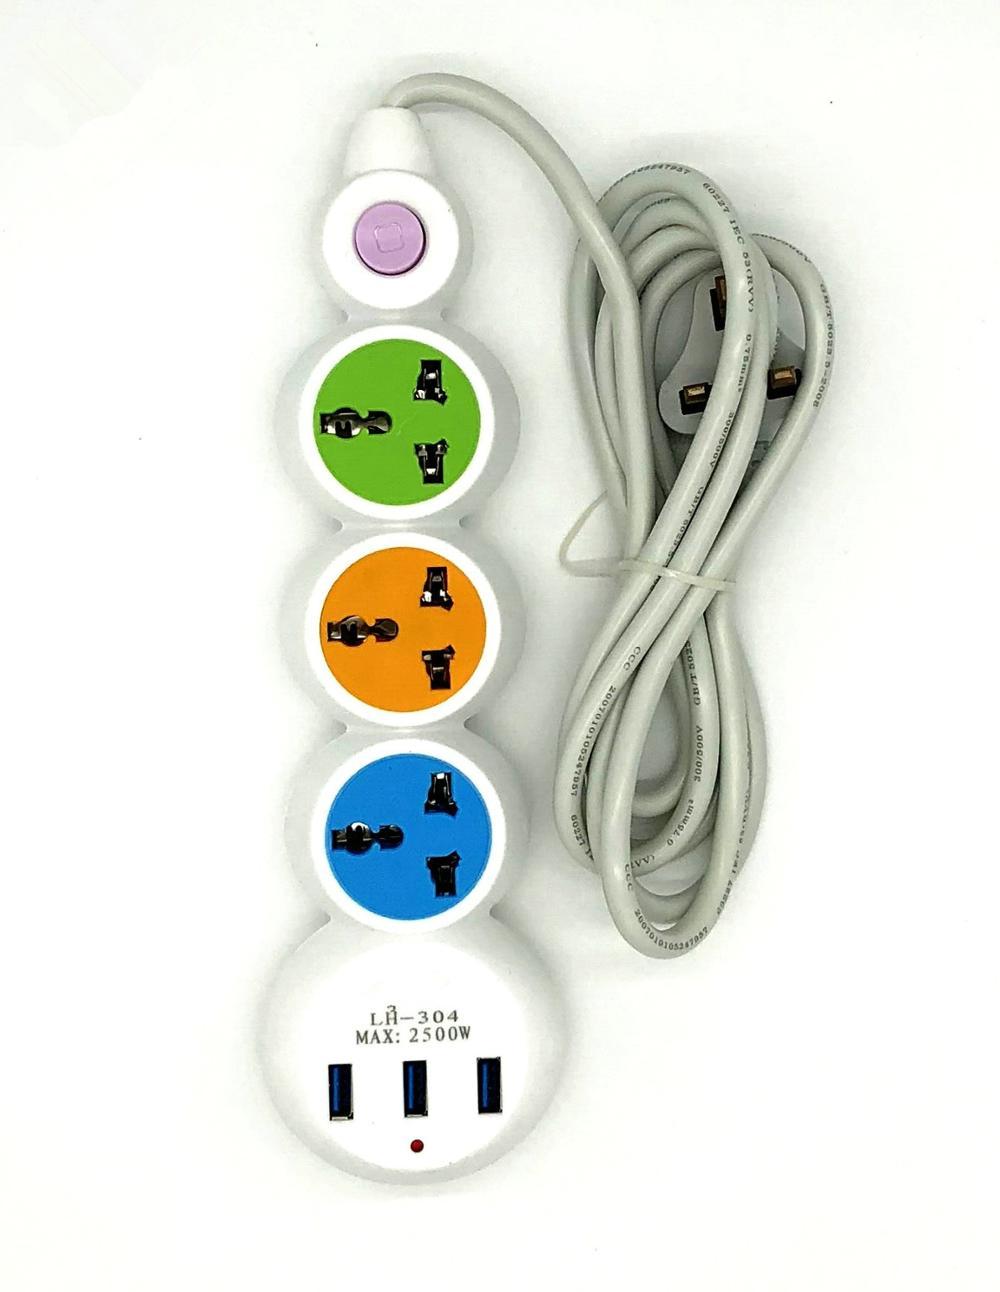 USB Power Strip Power Sockets + 3 USB Outlets Protected Extension Lead Adapter USB Socket EU UK US Plug